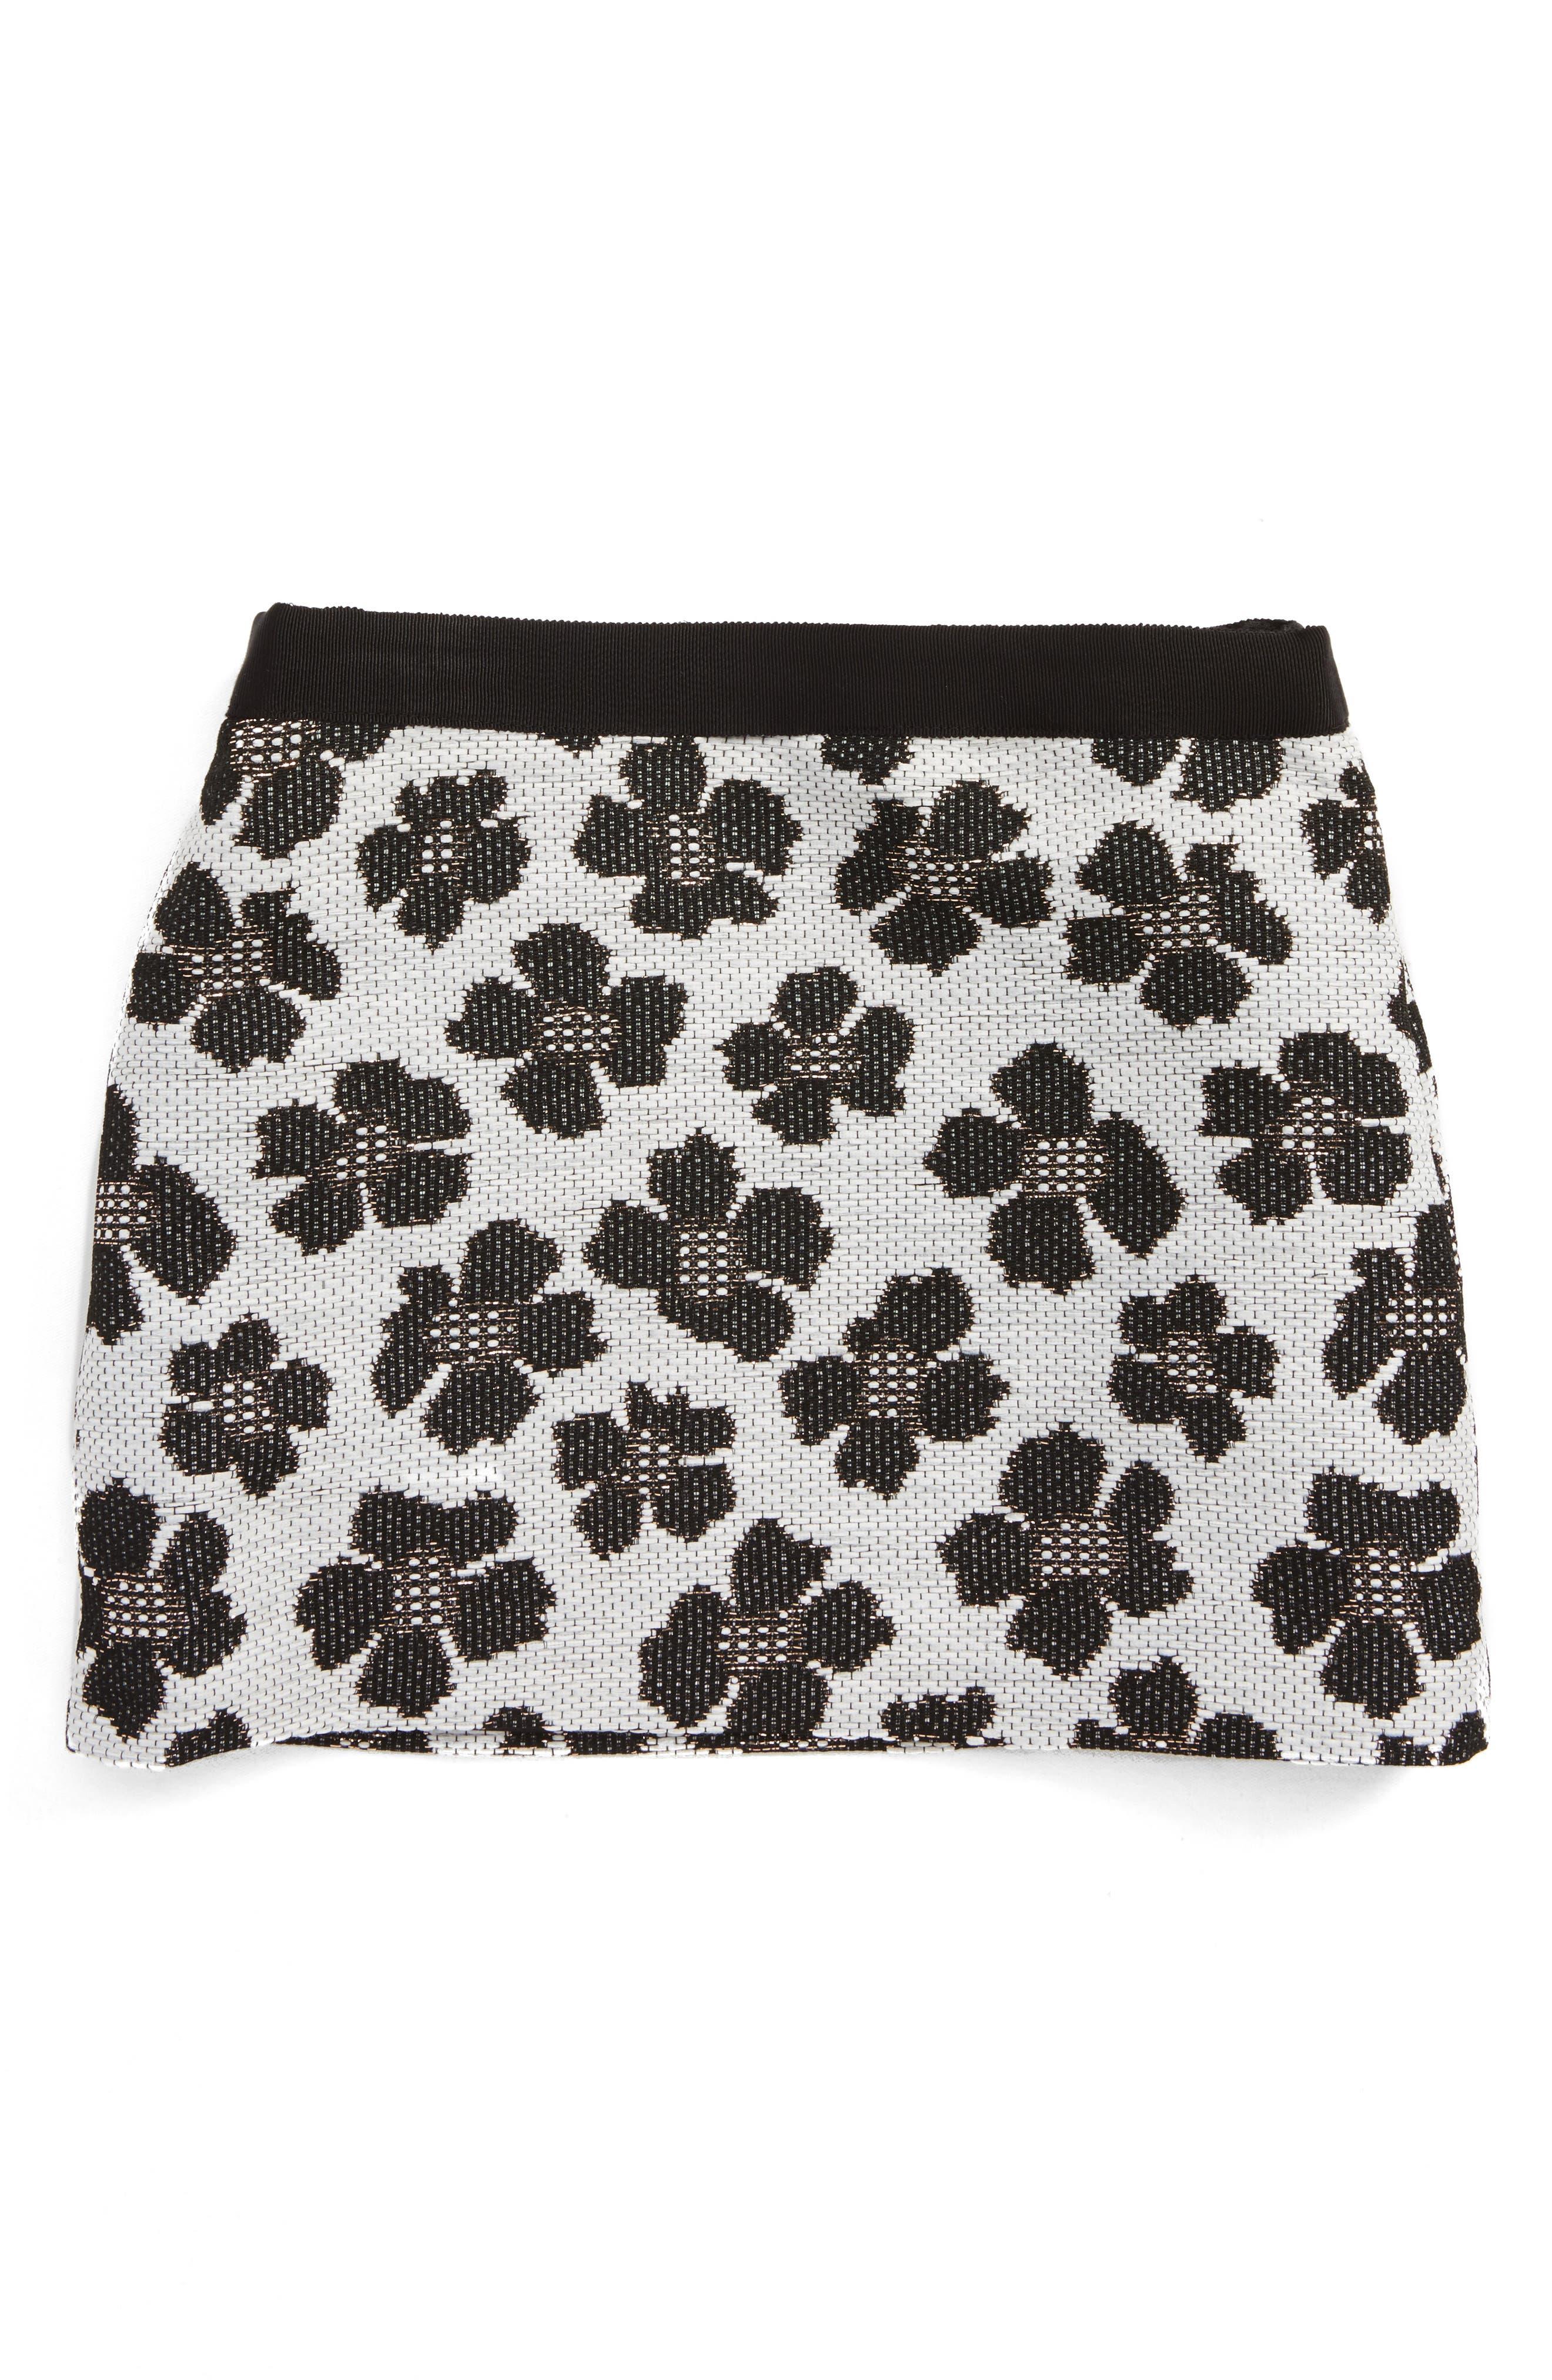 MILLY Minis Metallic Jacquard Miniskirt